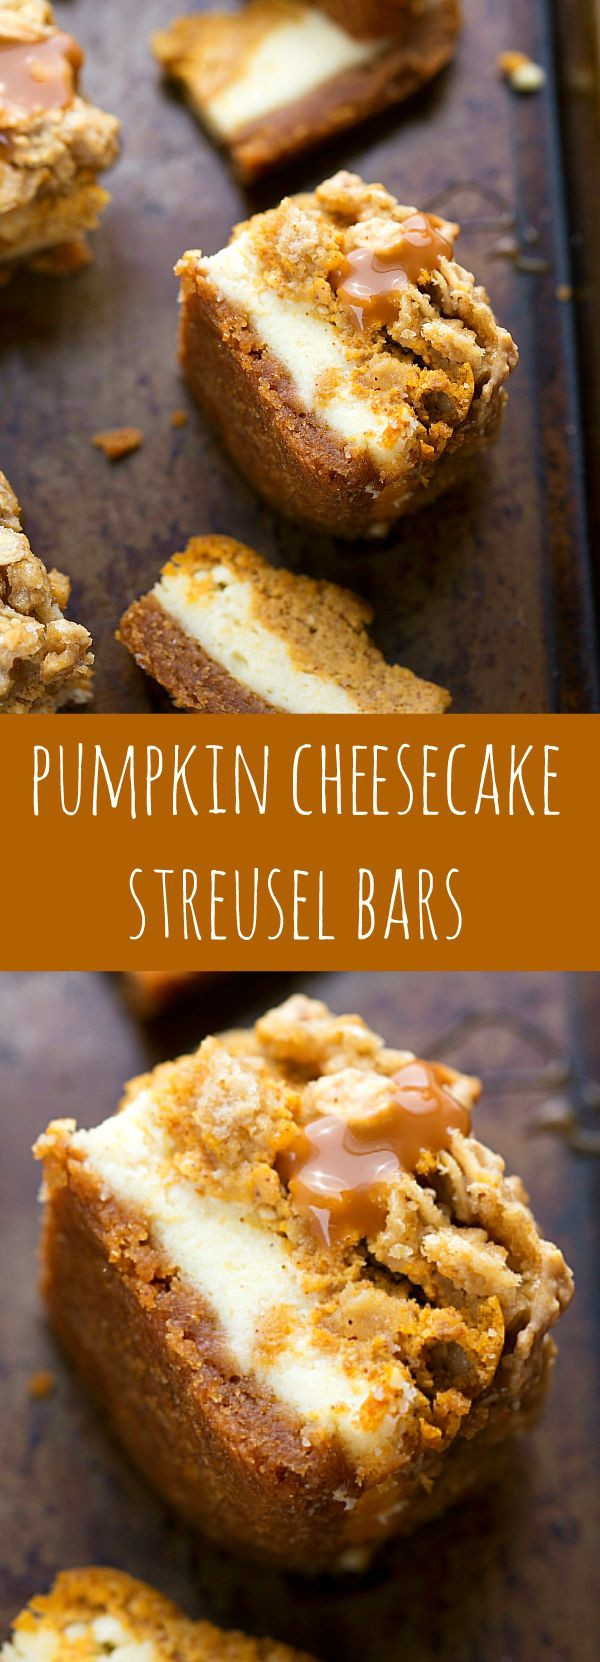 Fall Pumpkin Desserts  1000 images about Fall PUMPKIN Desserts Recipes on